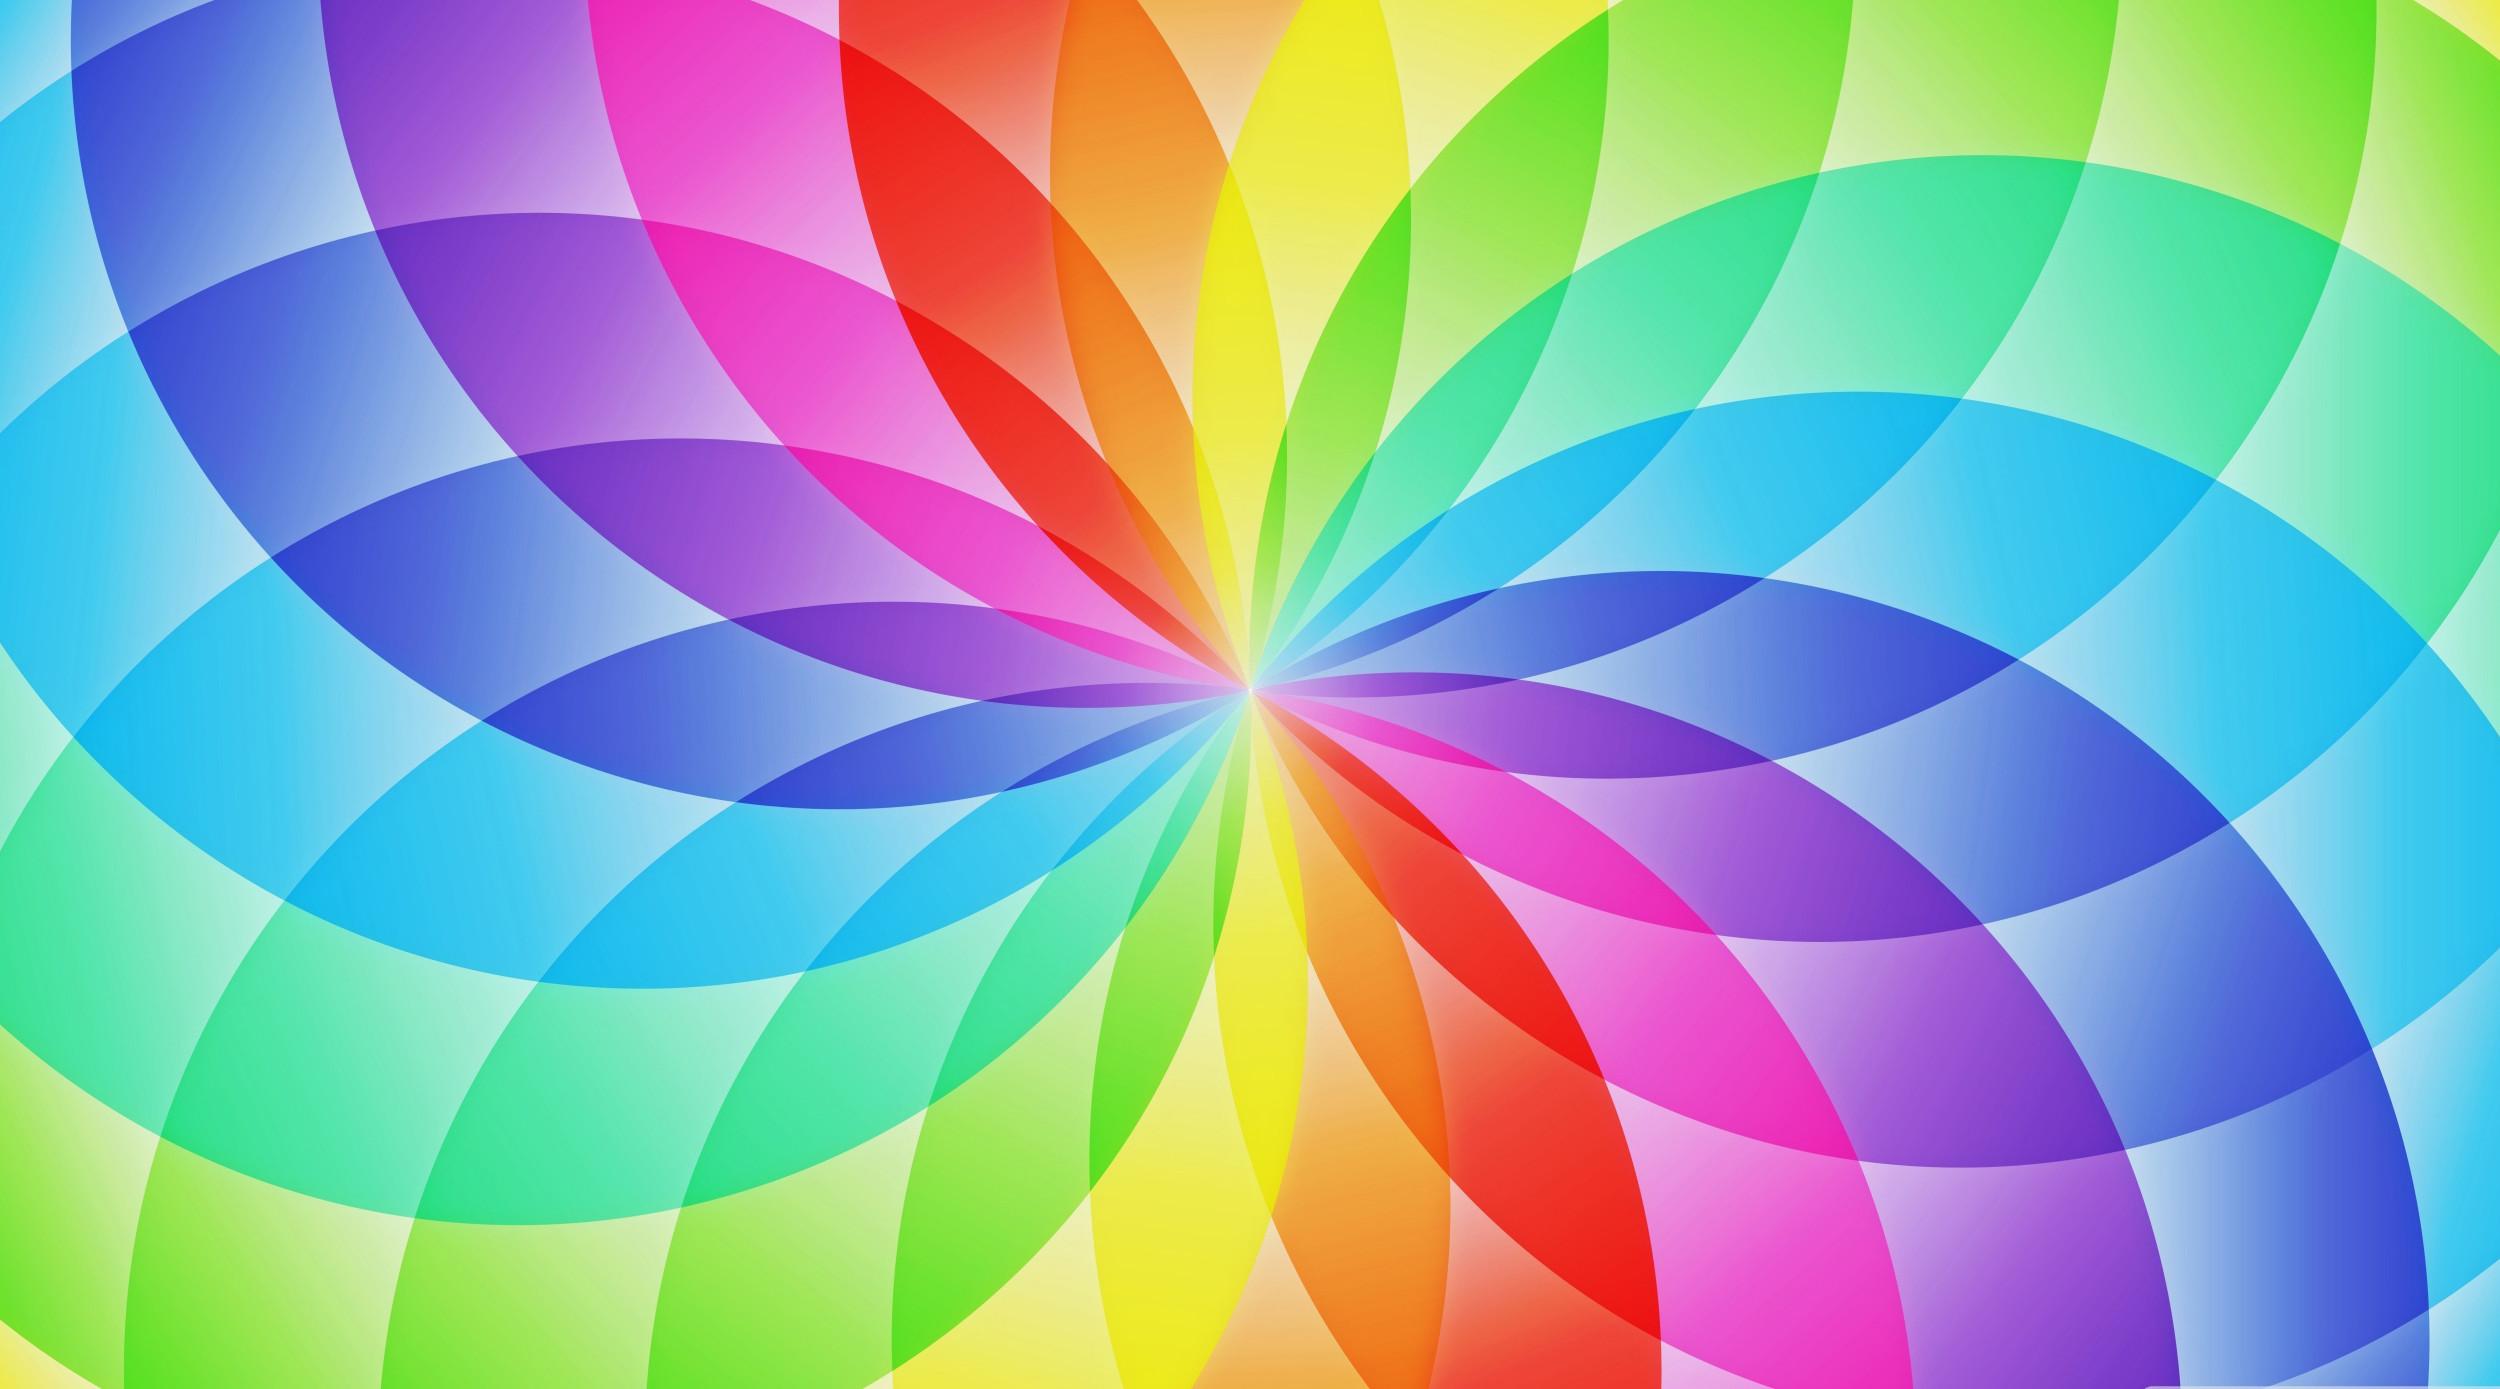 0 Rainbow Desktop Wallpaper HD Rainbow Flower Wallpapers Full HD Flower  Rainbow Moon Black Pastel .